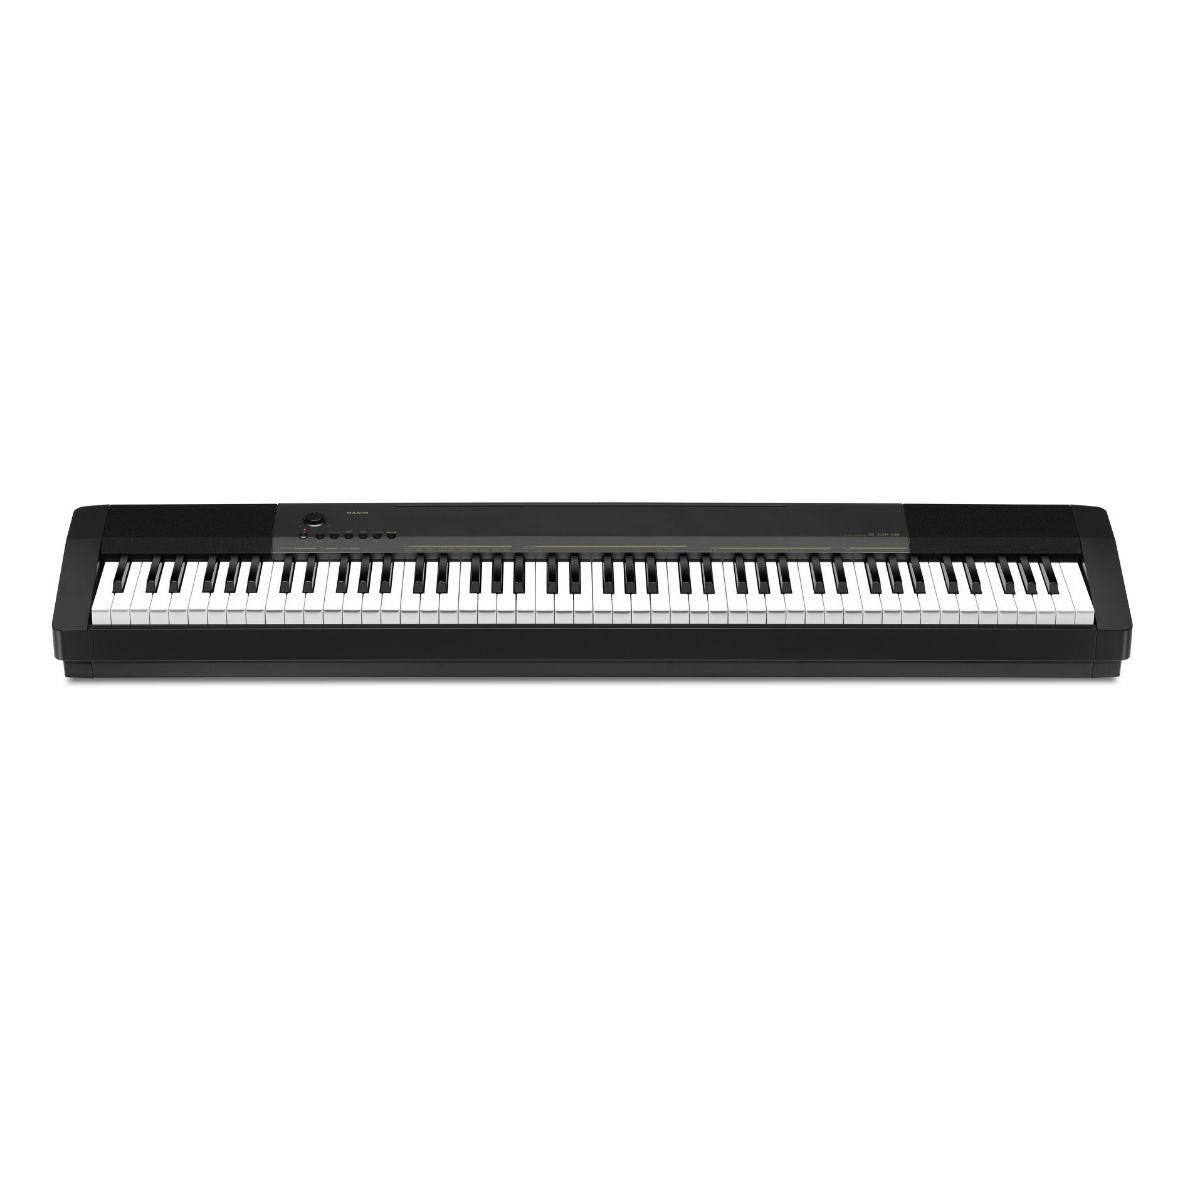 piano digital 88 teclas casio cdp 130bk kalifa. Black Bedroom Furniture Sets. Home Design Ideas